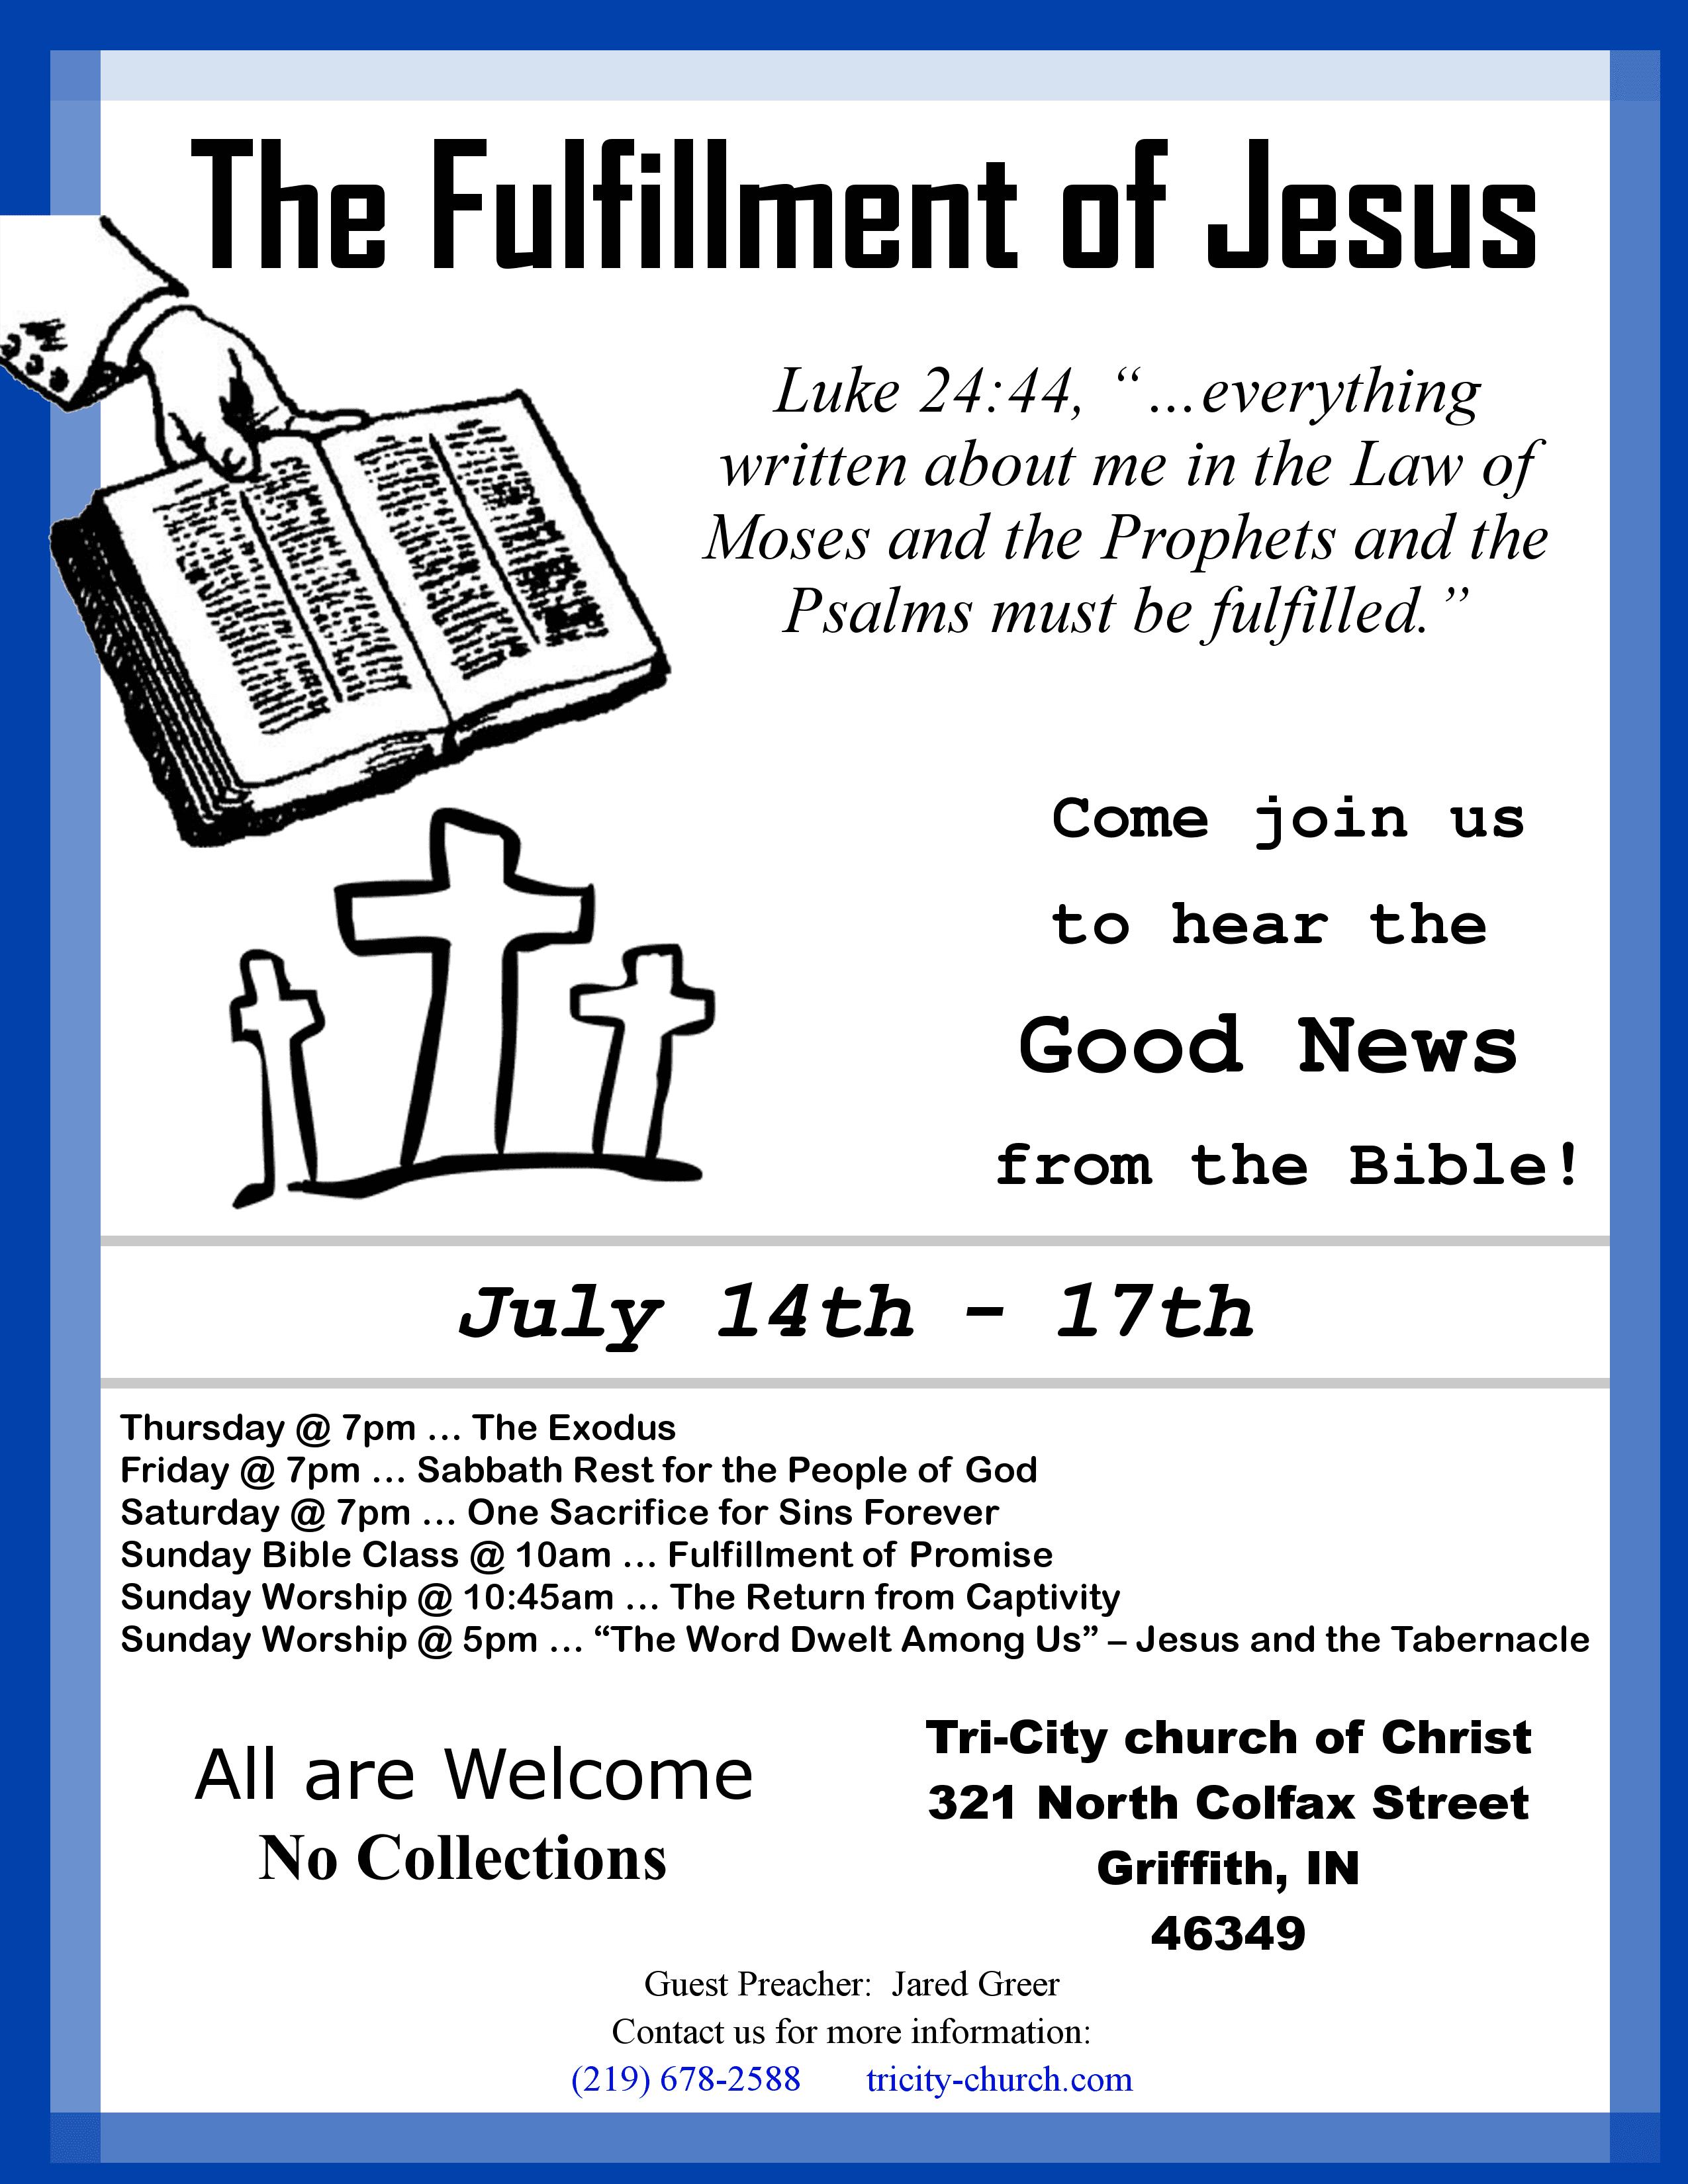 Fulfillment-of-Jesus-Gospel-Meeting